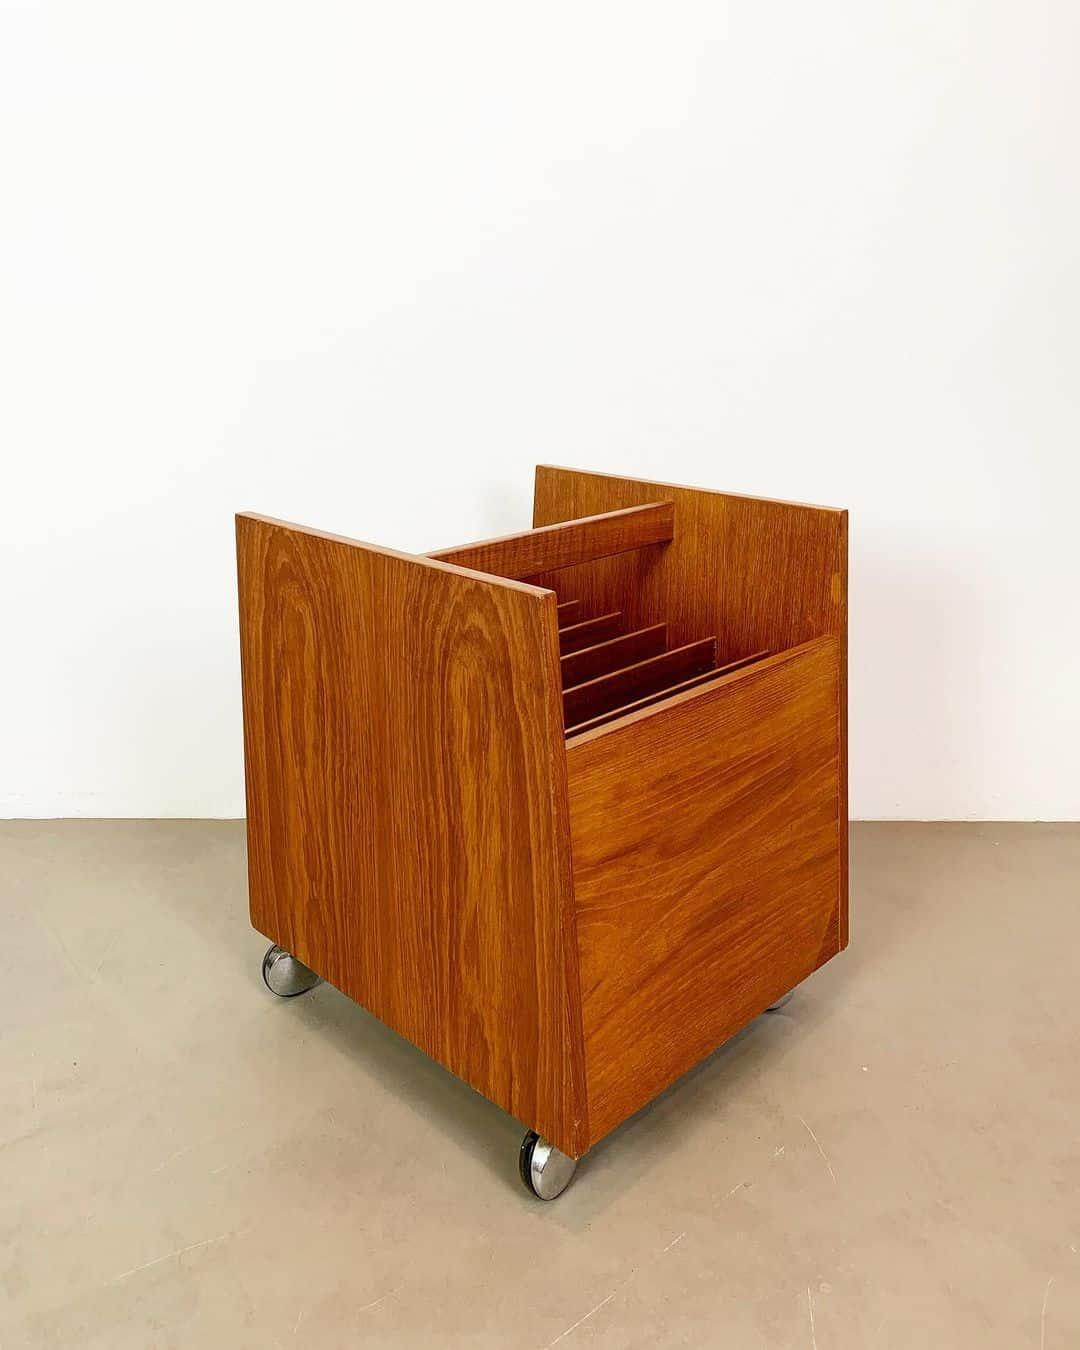 Scala Bruksbo Record Crate